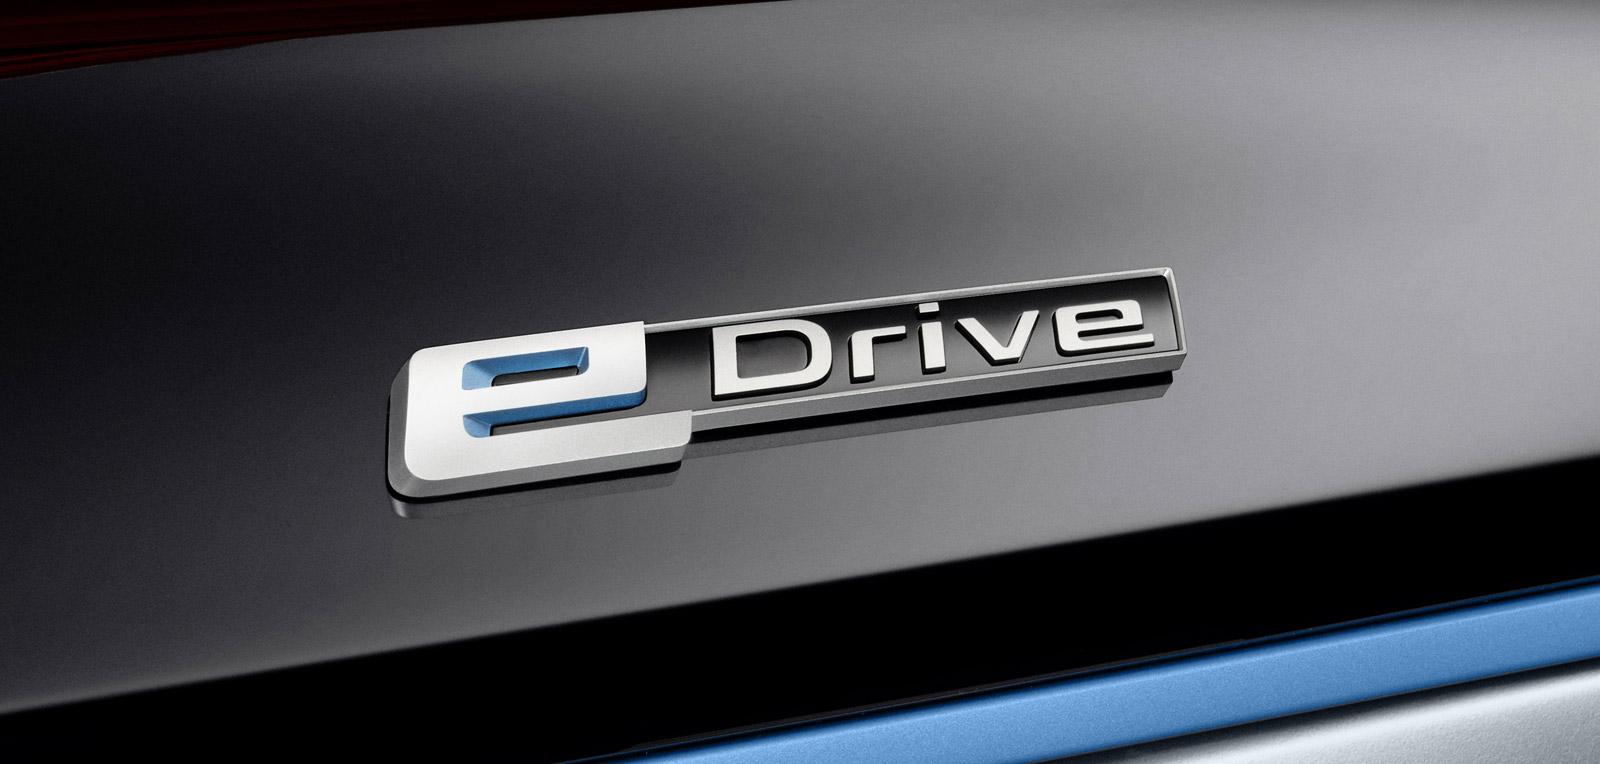 Bmw S Electric Cars Will Get Edrive Designation